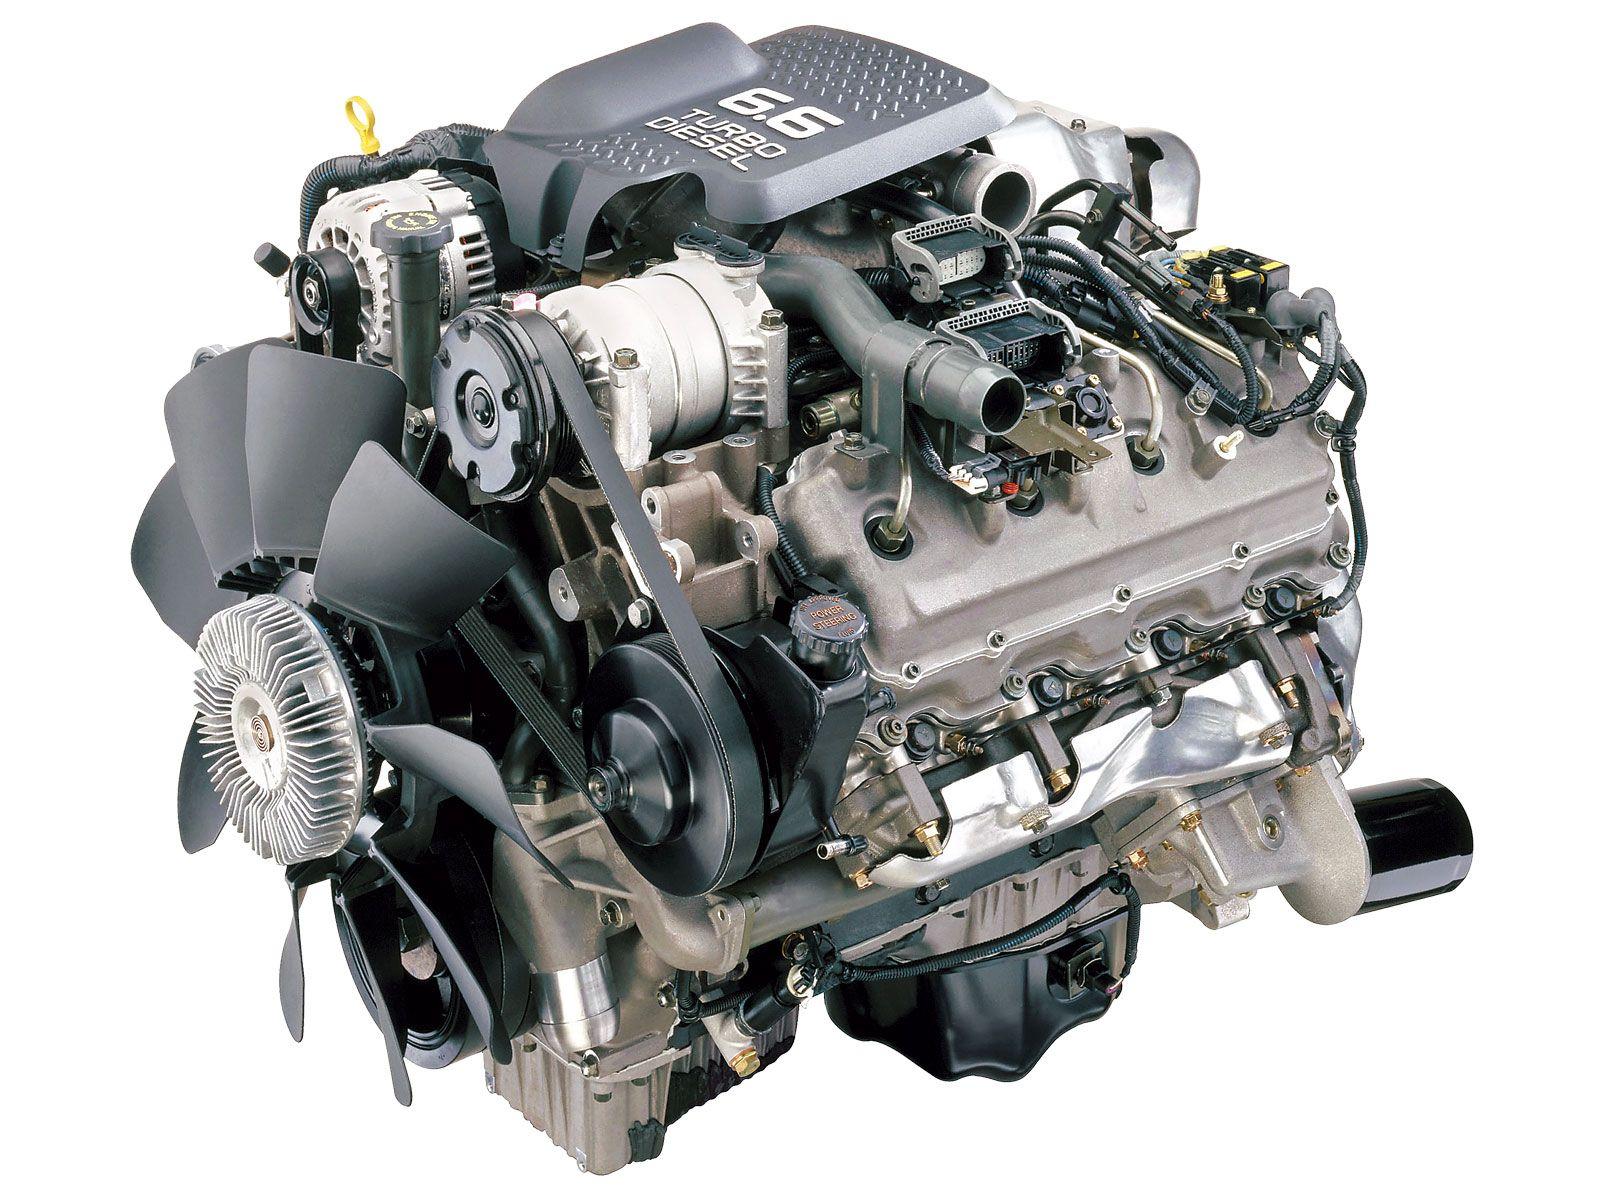 1301dp 07 Diesel Engine Spotters Guide Duramax 6600 Lb7 Photo 7